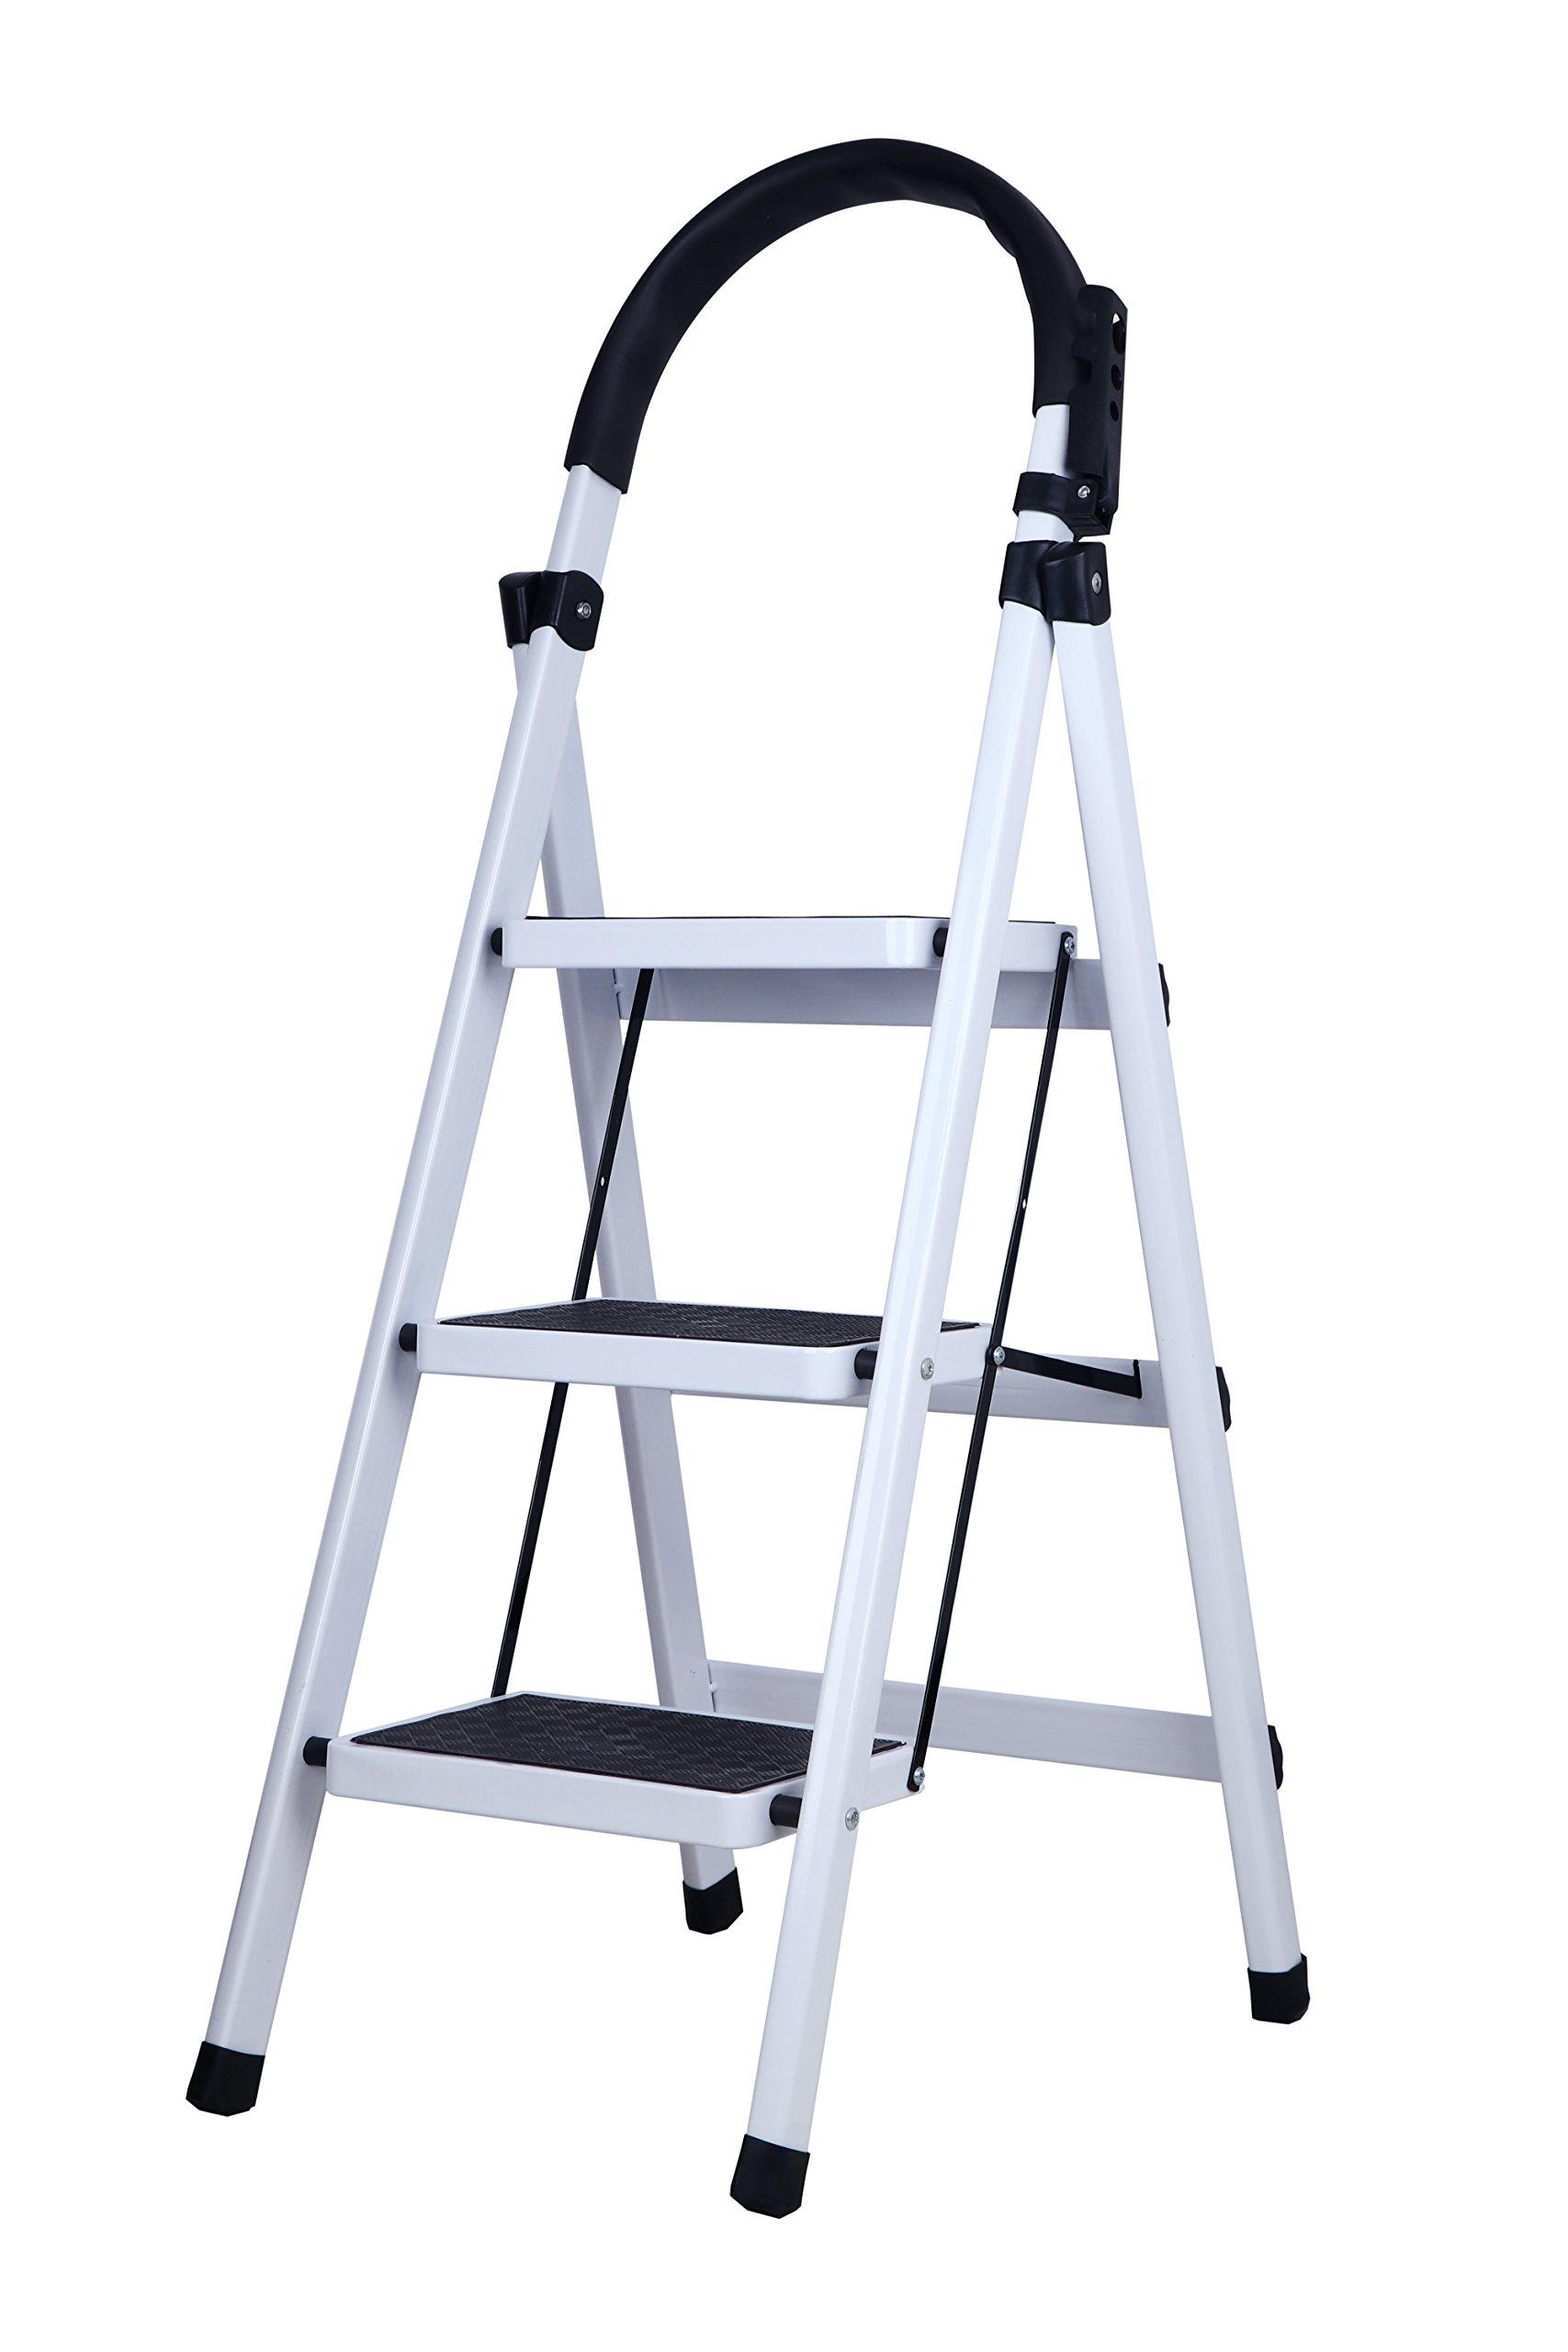 Household Folding 3-Step Steel Frame Stool Platform Ladder with Plastic Cushion Handgrip & Anti-Slip Sturdy Wide Pedal Portable Steel Step Stool White Ladder (3 Step)